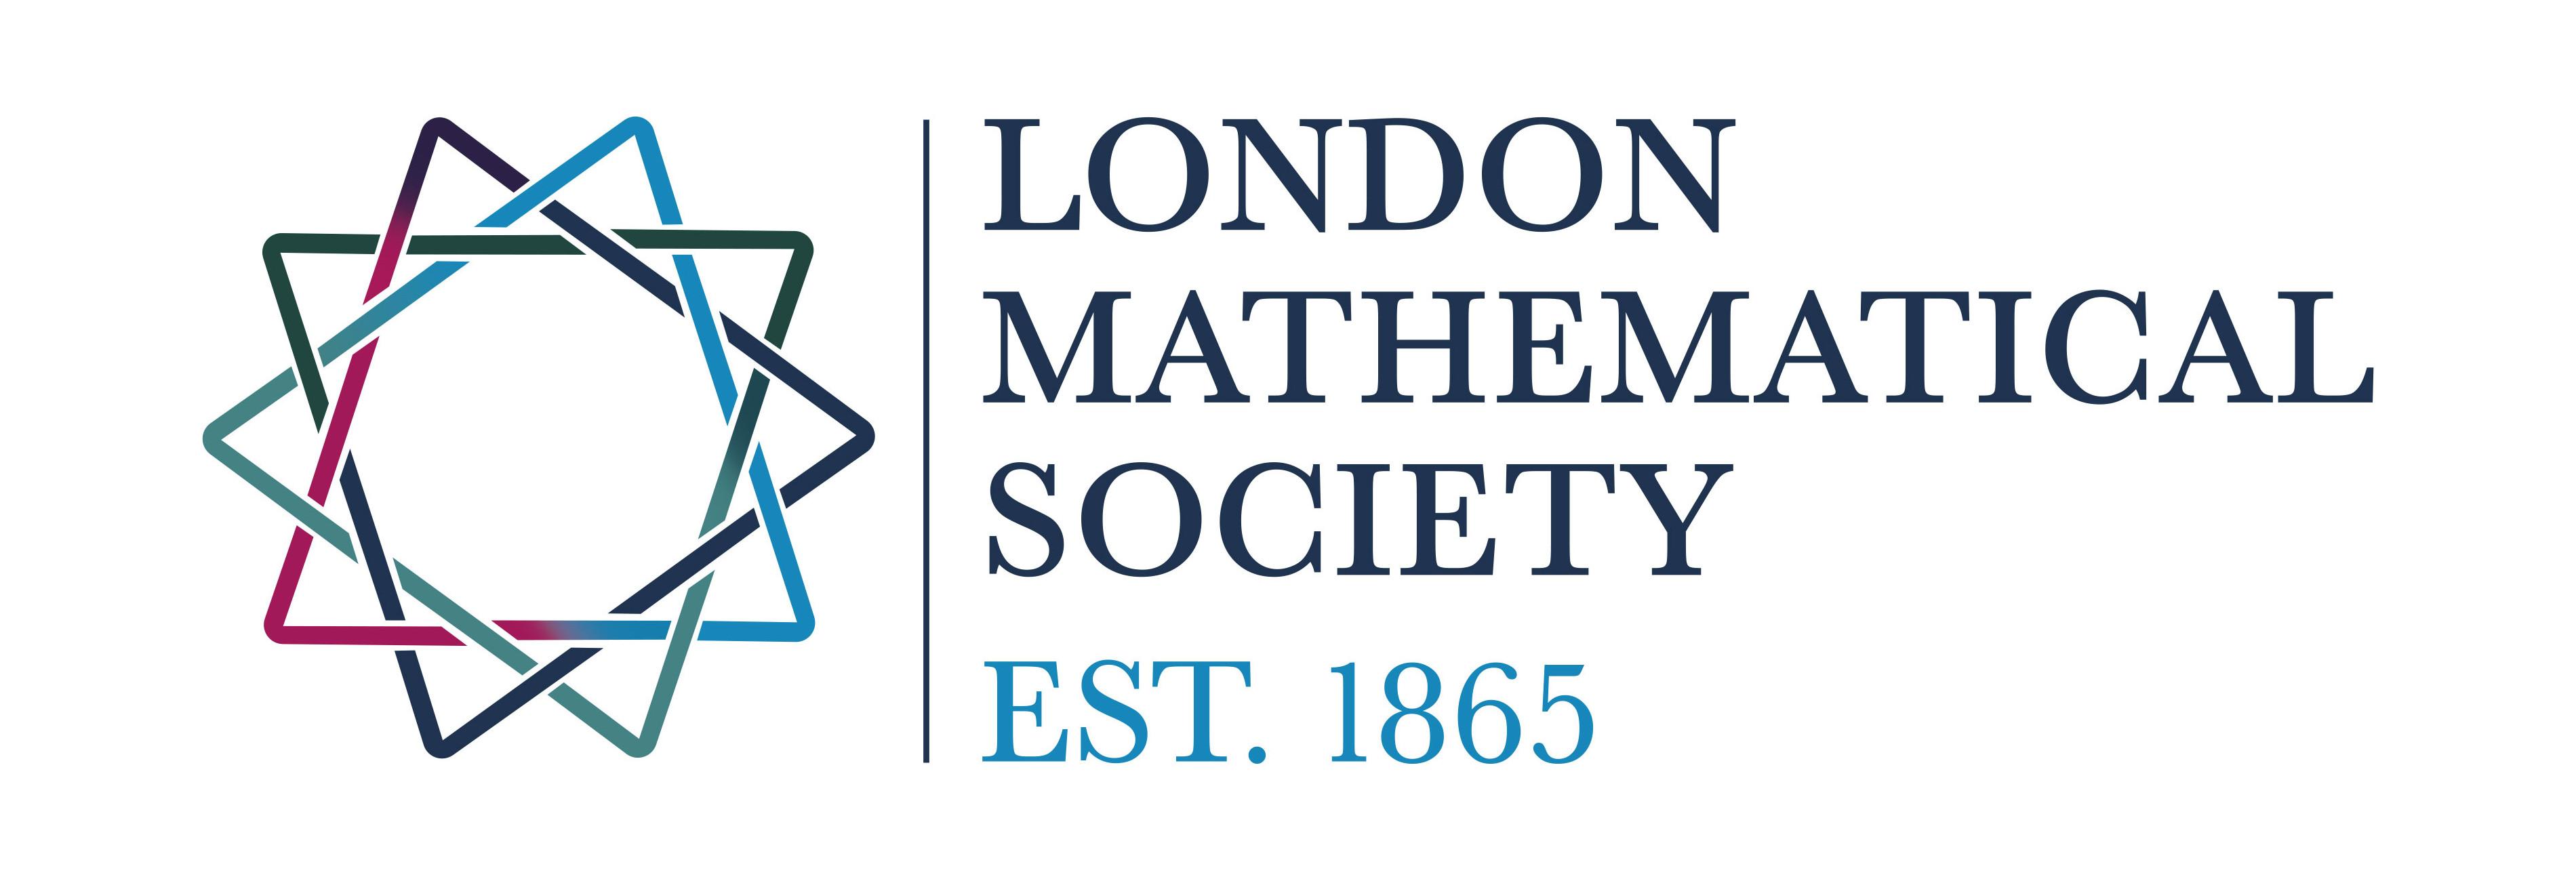 The London Mathematical Society logo